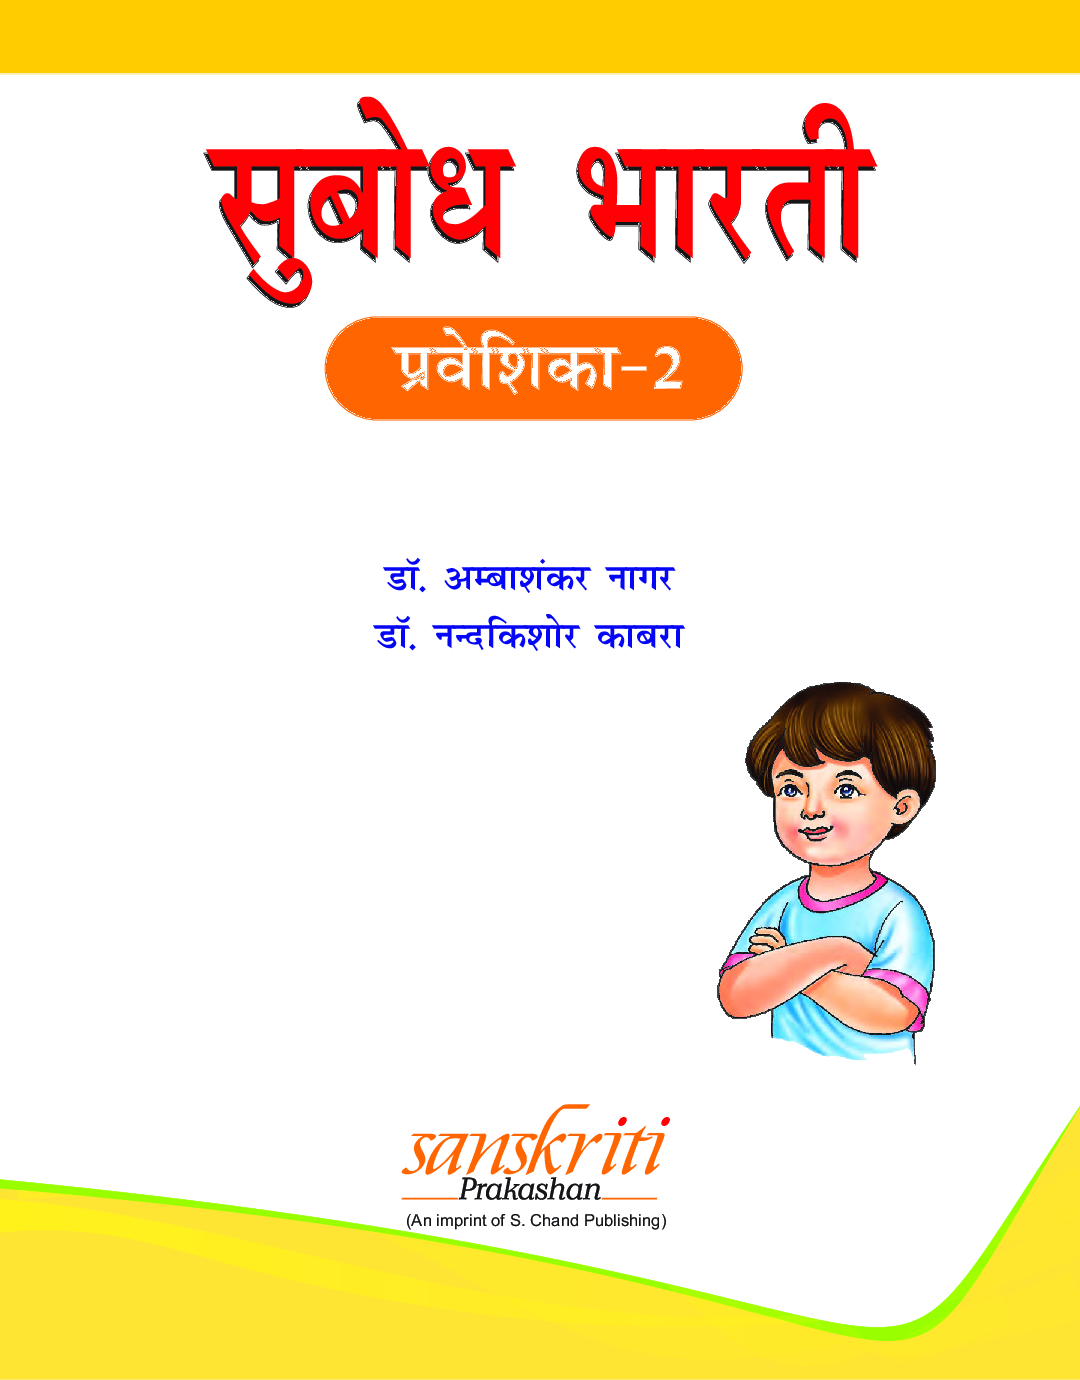 सुबोध भारती हिंदी पाठमाला प्रवेशिका - 2 - Page 2